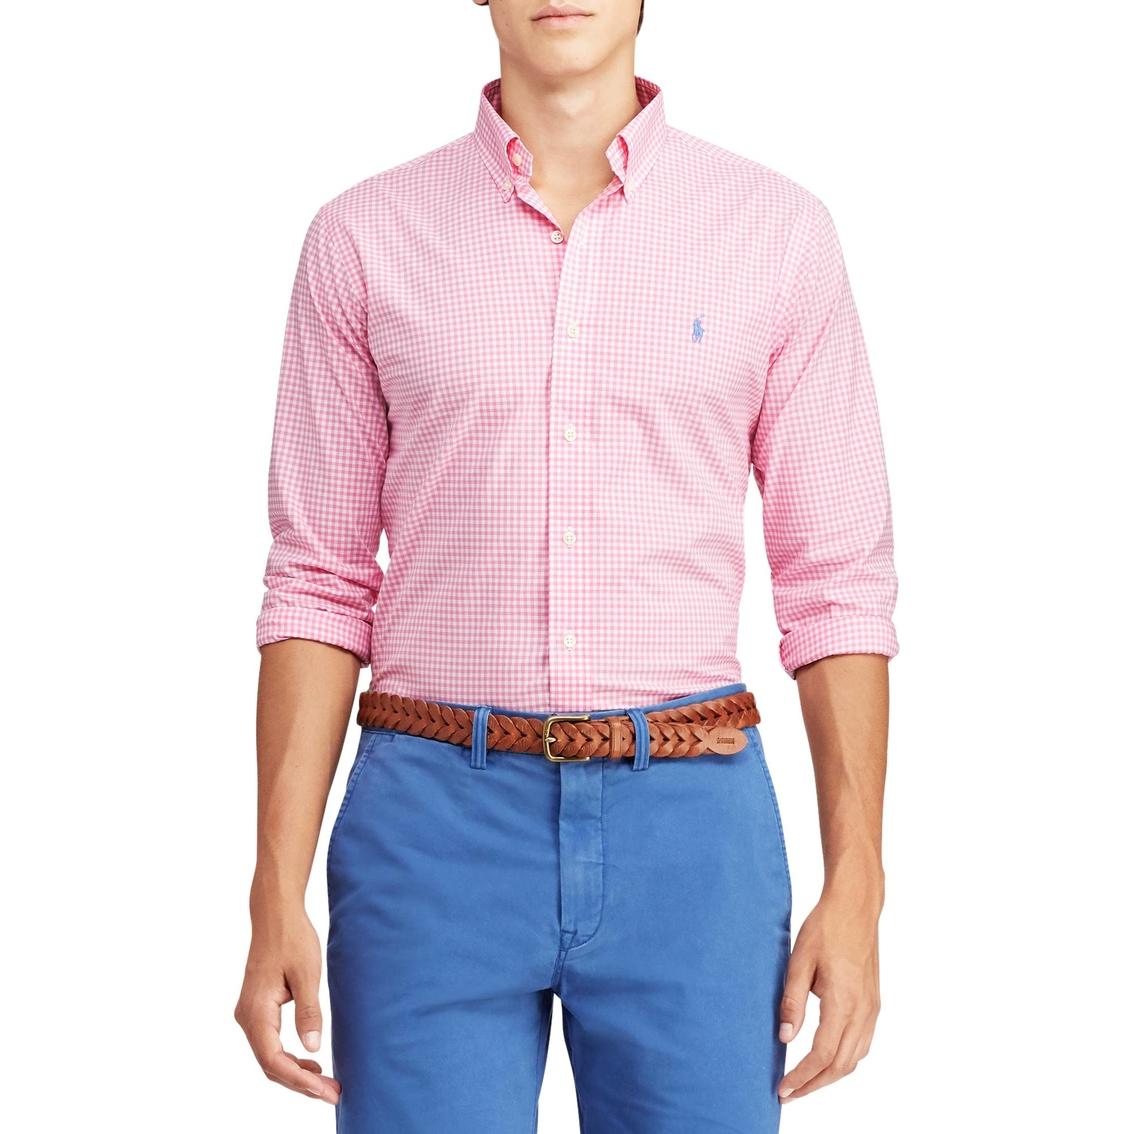 8ac452db Polo Ralph Lauren Classic Fit Gingham Shirt | Dress Shirts | Apparel ...